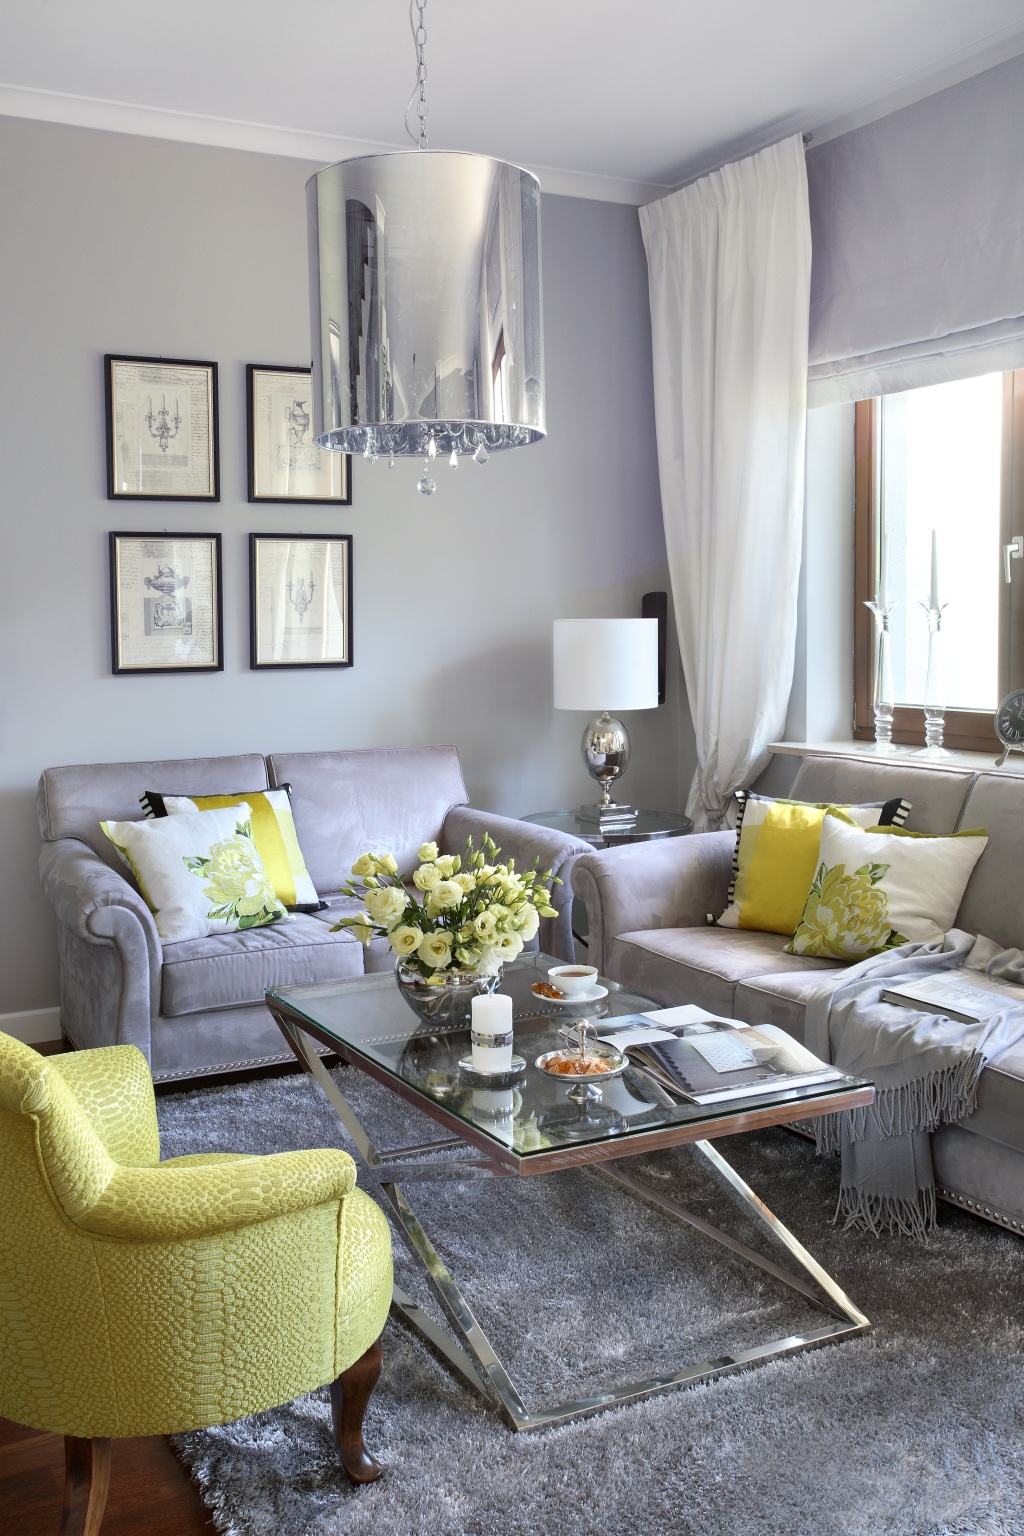 sweet living wn trza z pasj soczysta limonka i ch odny szary zgrany duet kolorystyczny. Black Bedroom Furniture Sets. Home Design Ideas